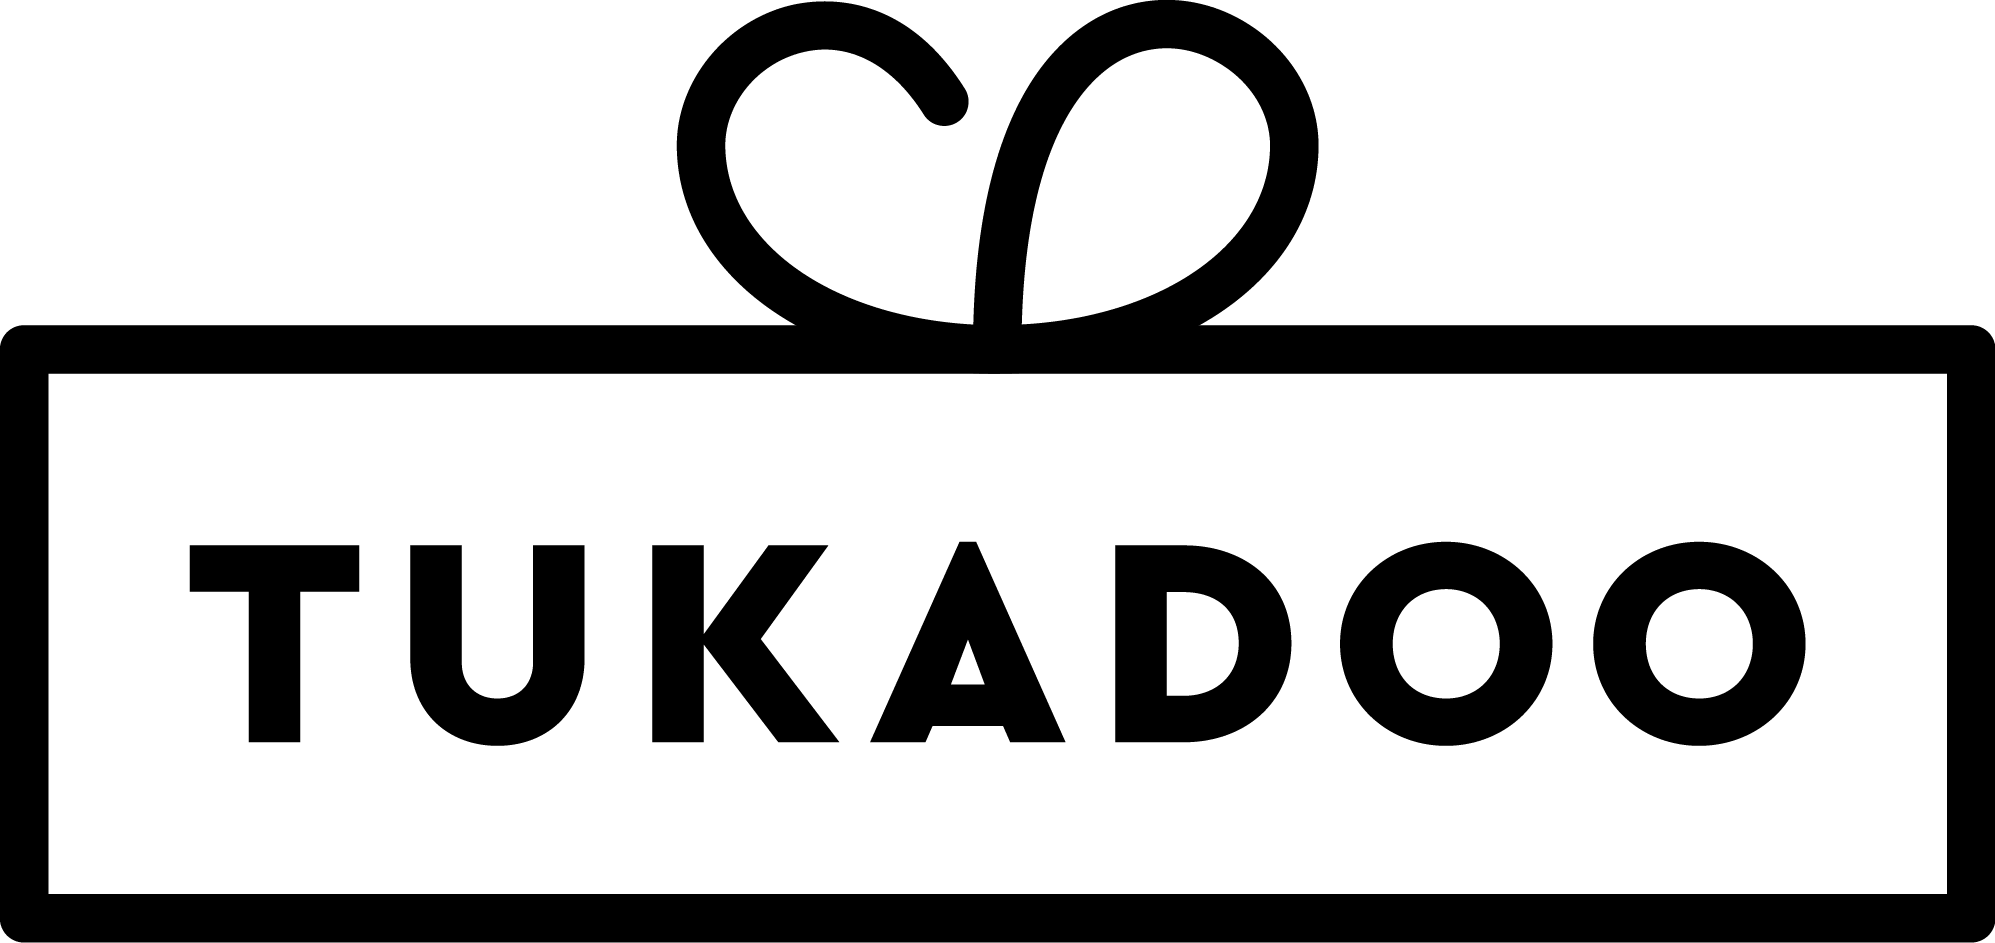 TUKADOO_ZWART.png